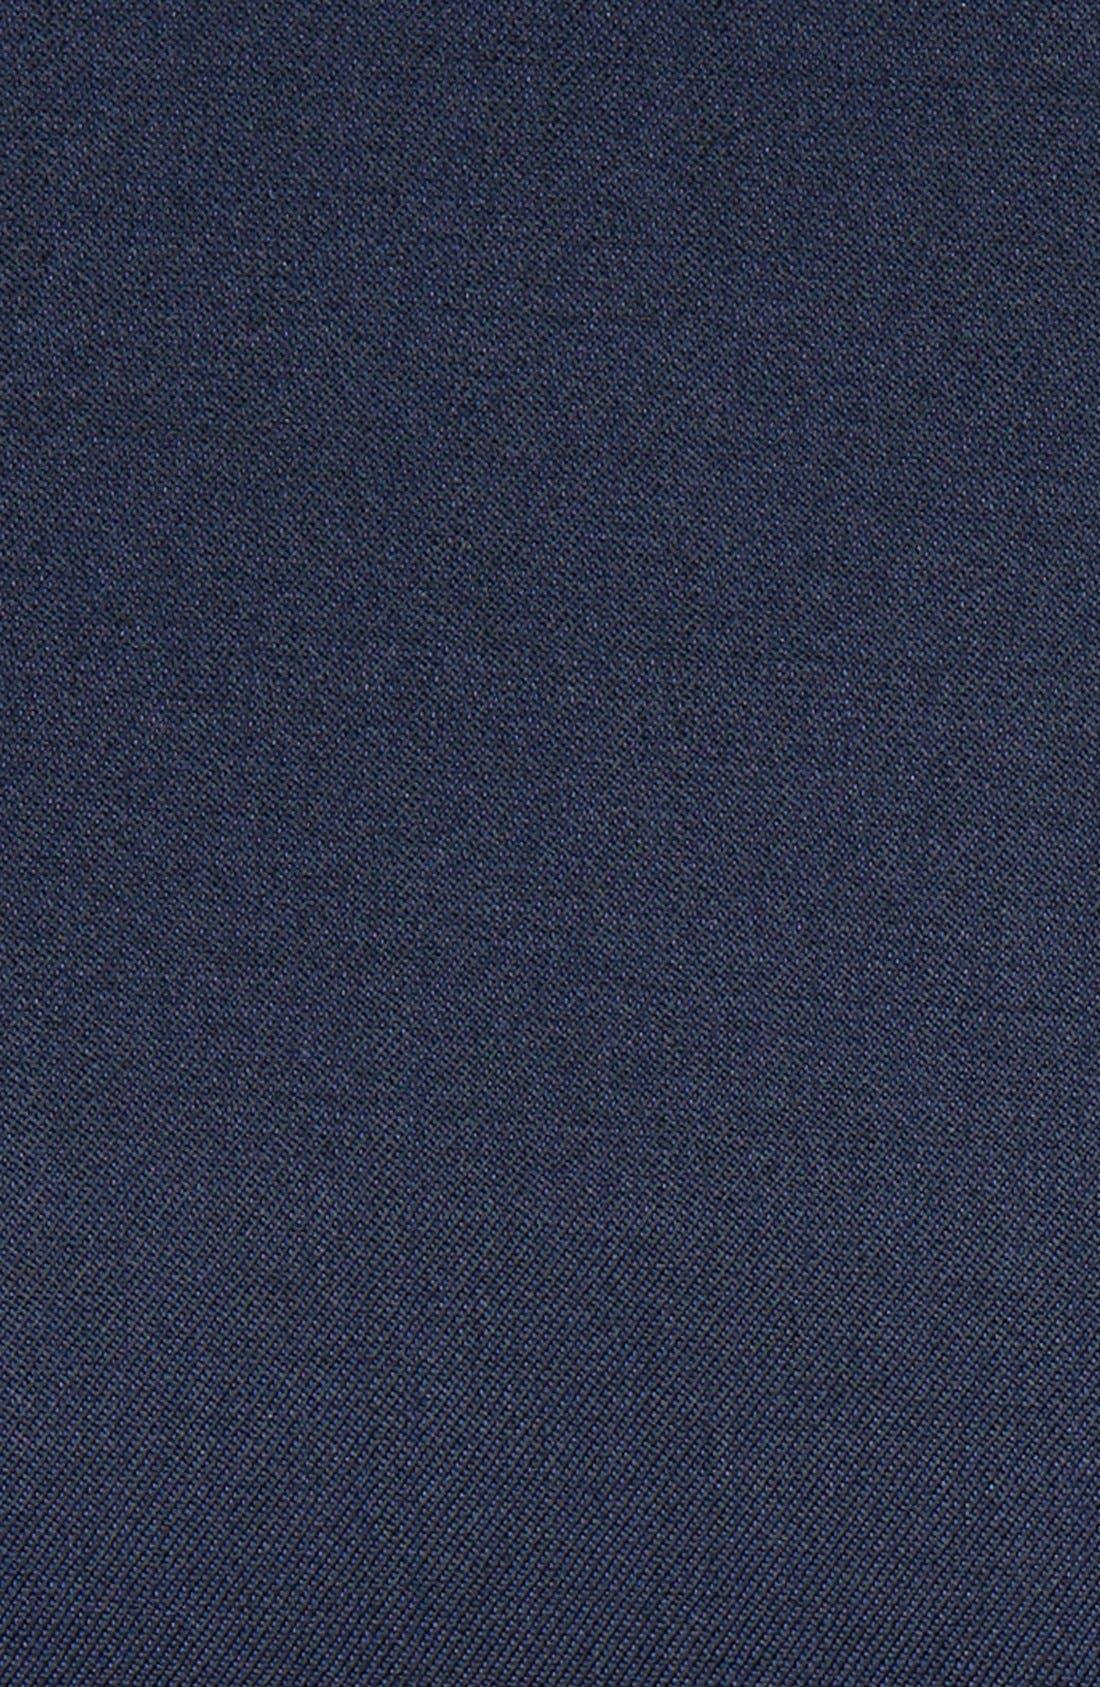 Alternate Image 7  - Ted Baker London 'Josh' Trim Fit Navy Shawl Lapel Tuxedo